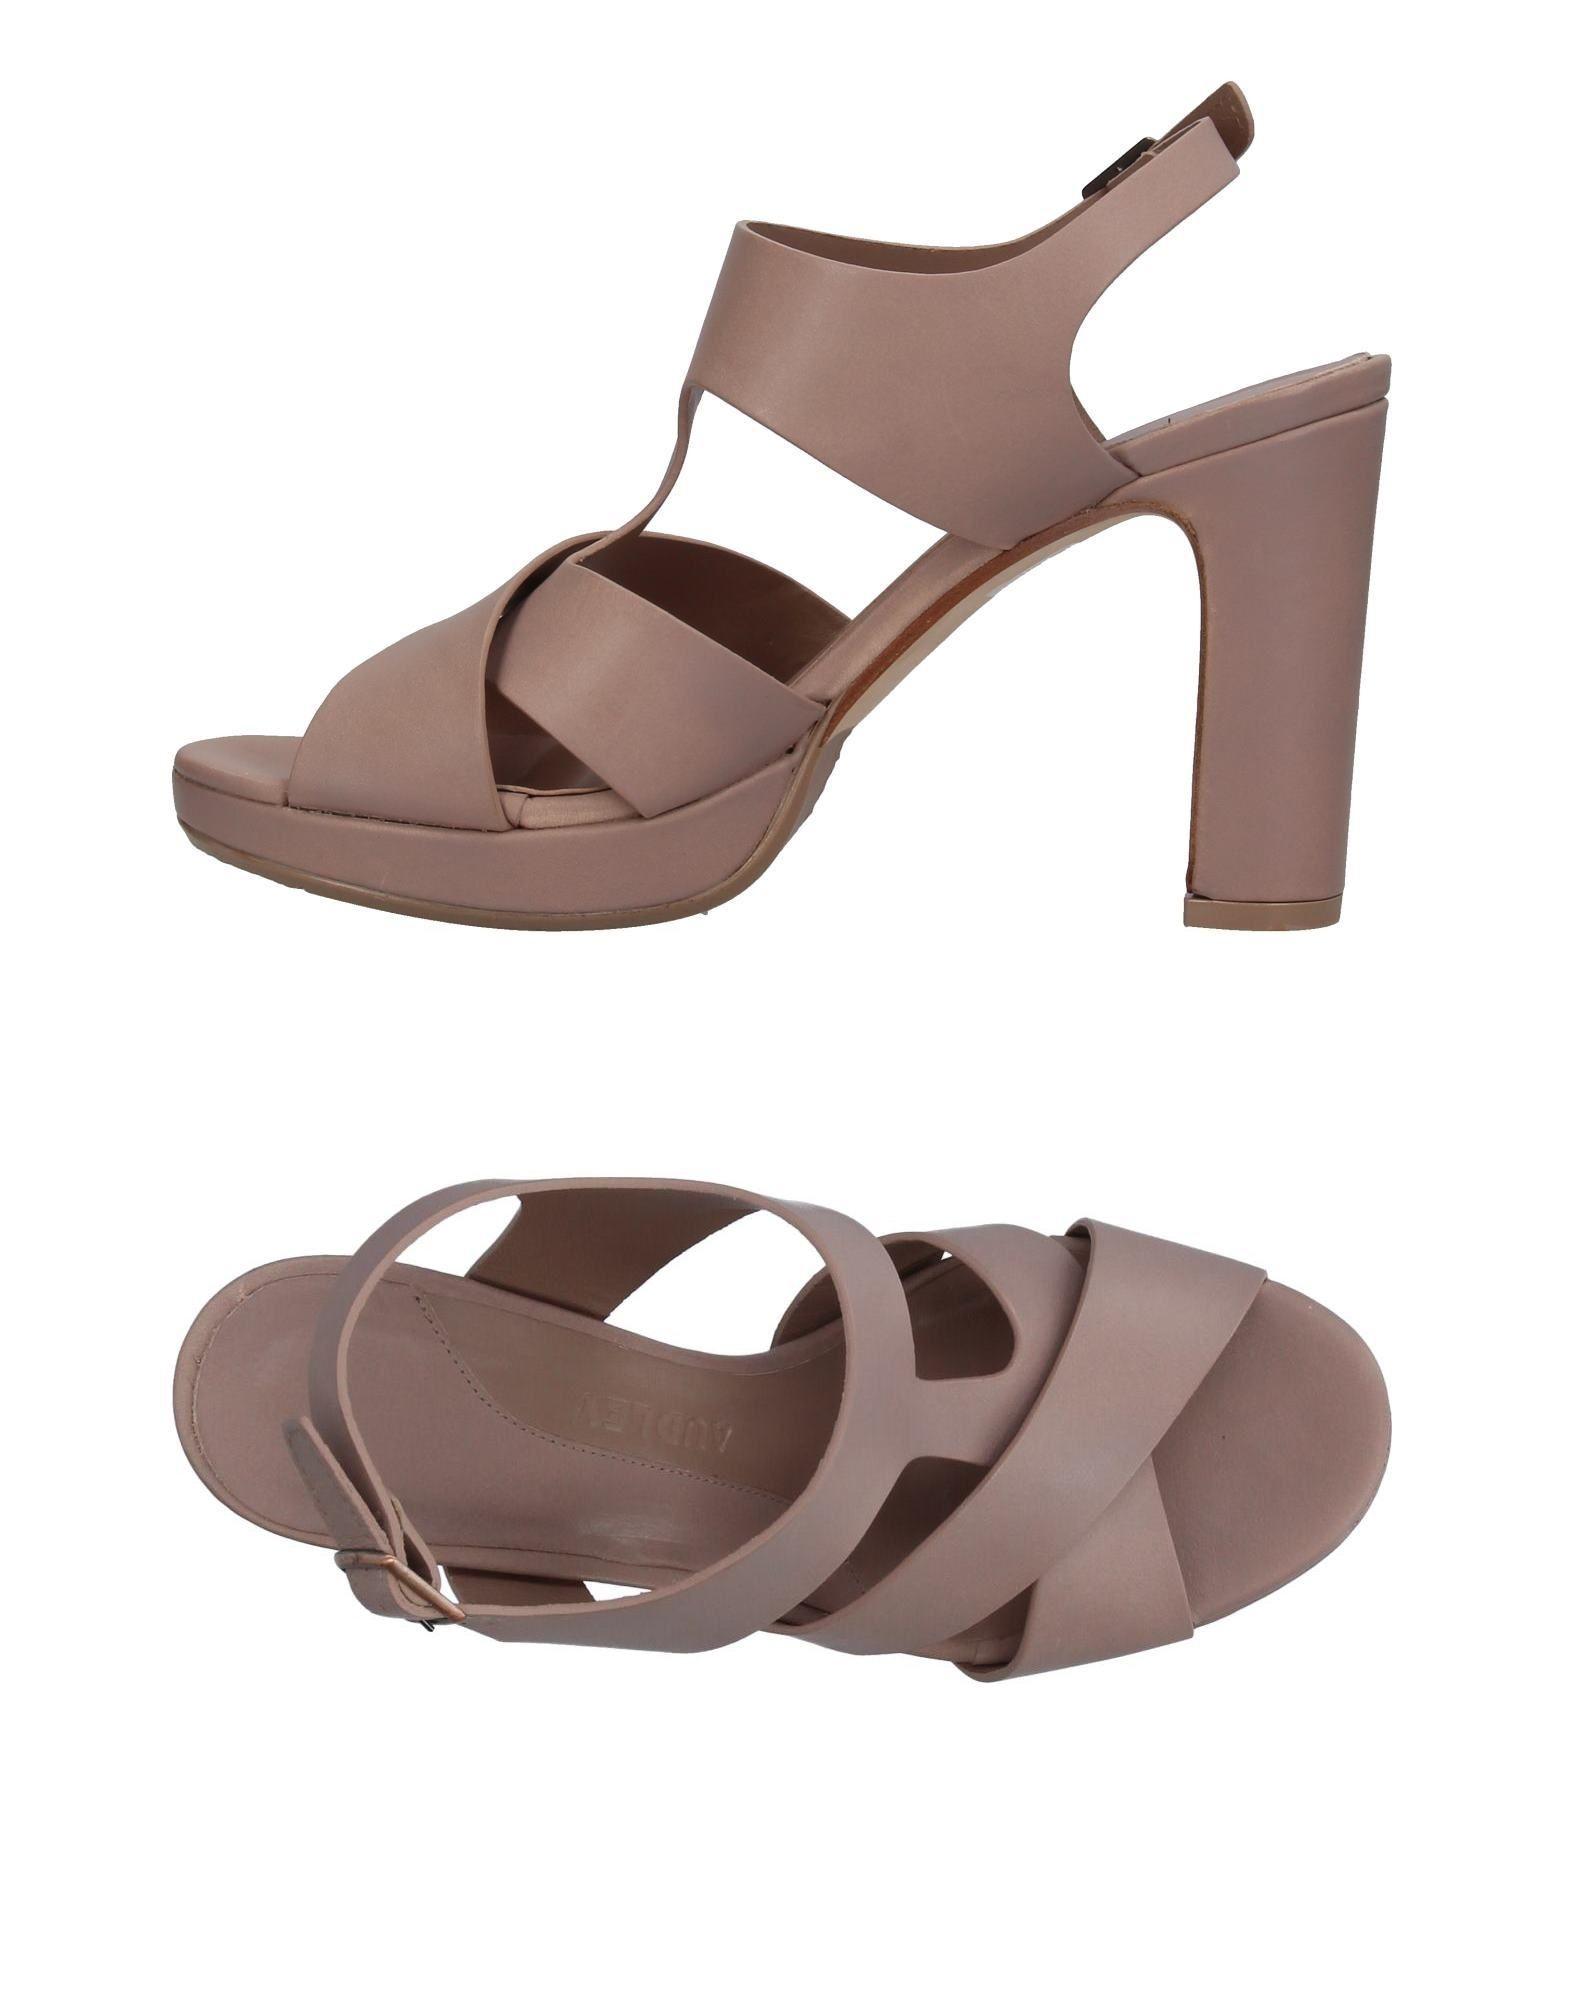 Audley Sandalen Damen  11360758TR Gute Qualität beliebte Schuhe